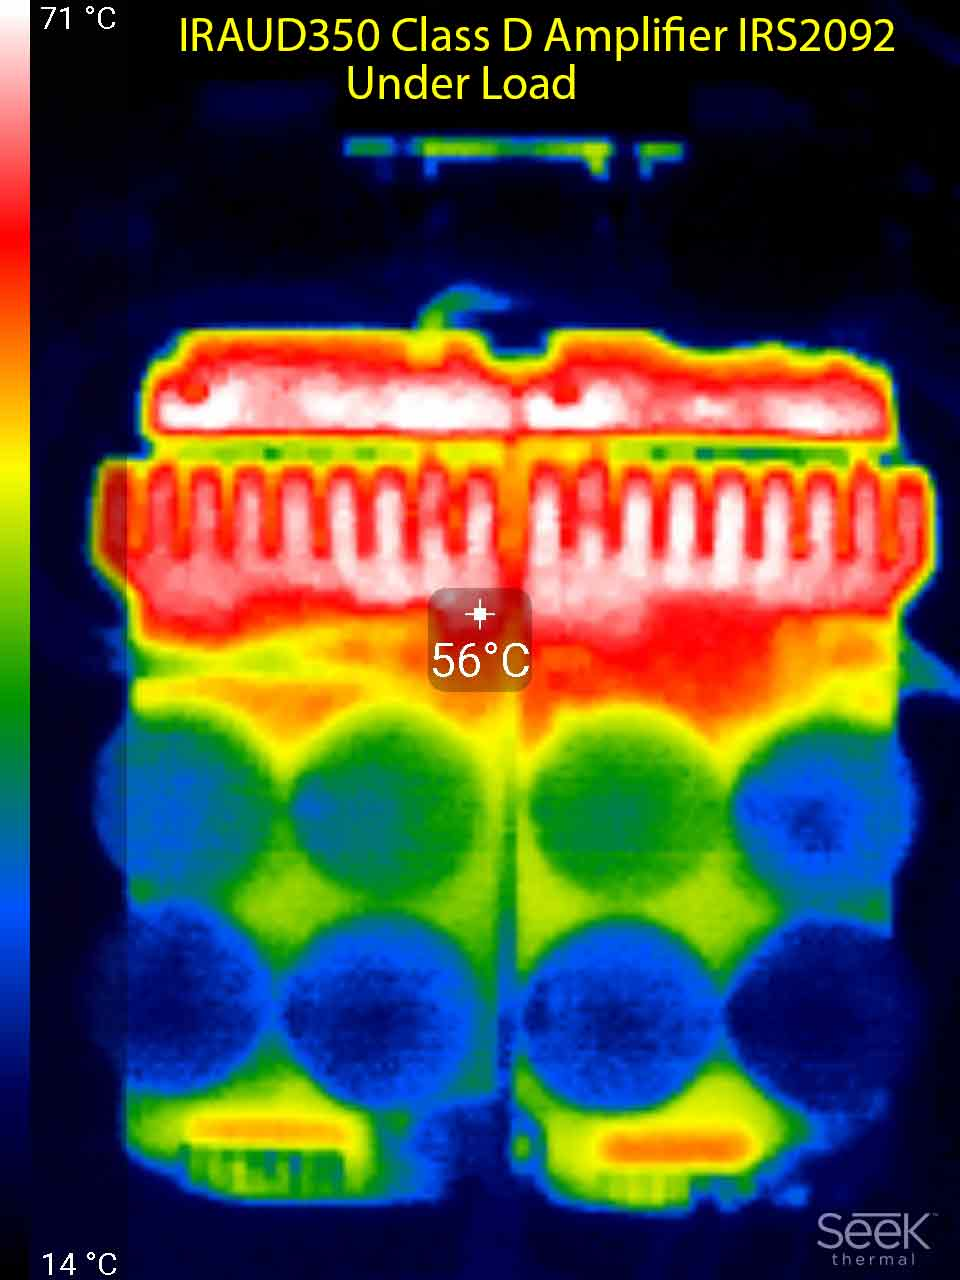 IRAUD350 Class D Amplifier IRS2092 Thermal IR measurement.jpg